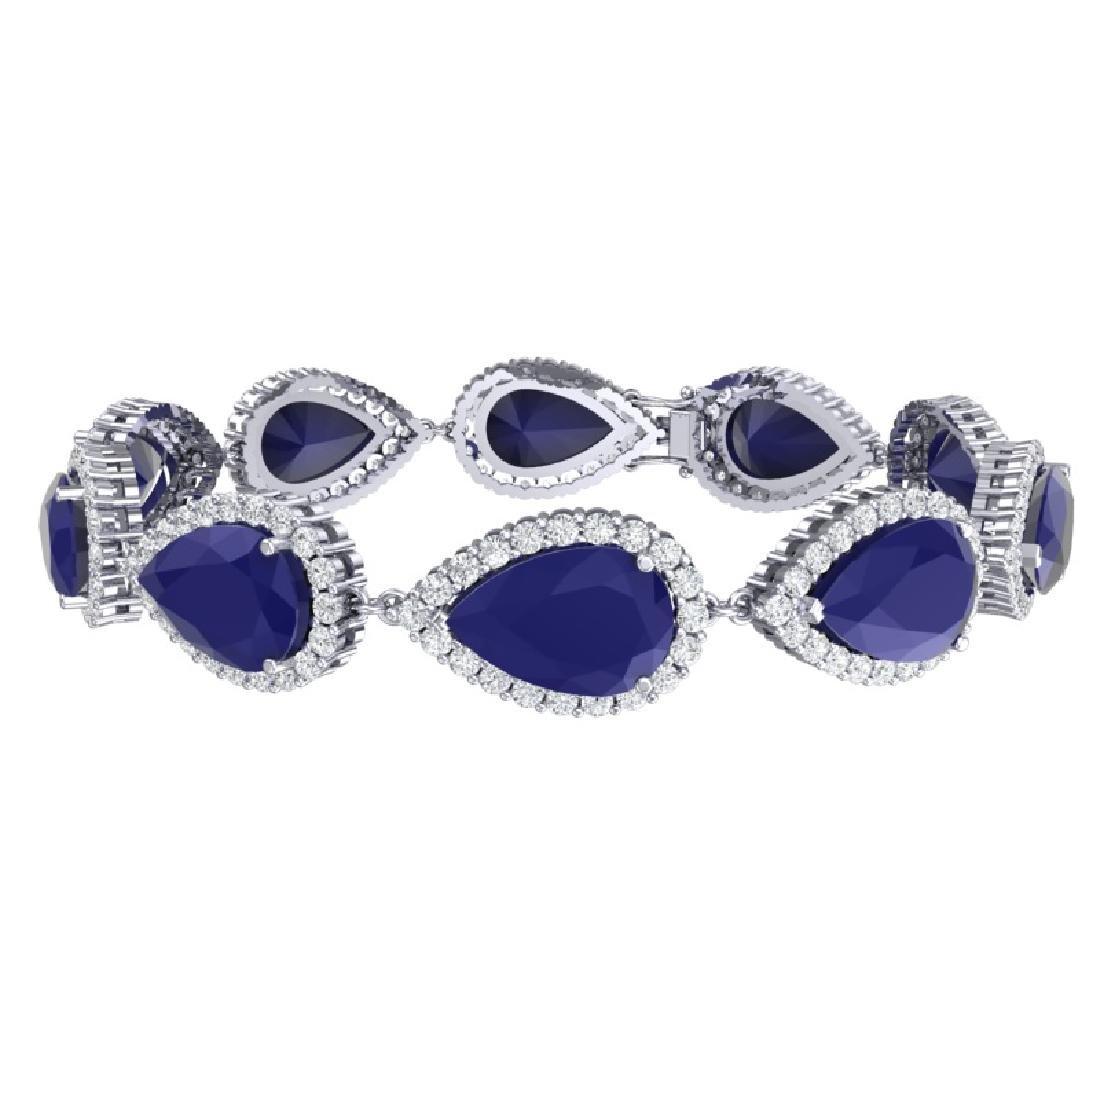 42 CTW Royalty Sapphire & VS Diamond Bracelet 18K White - 3